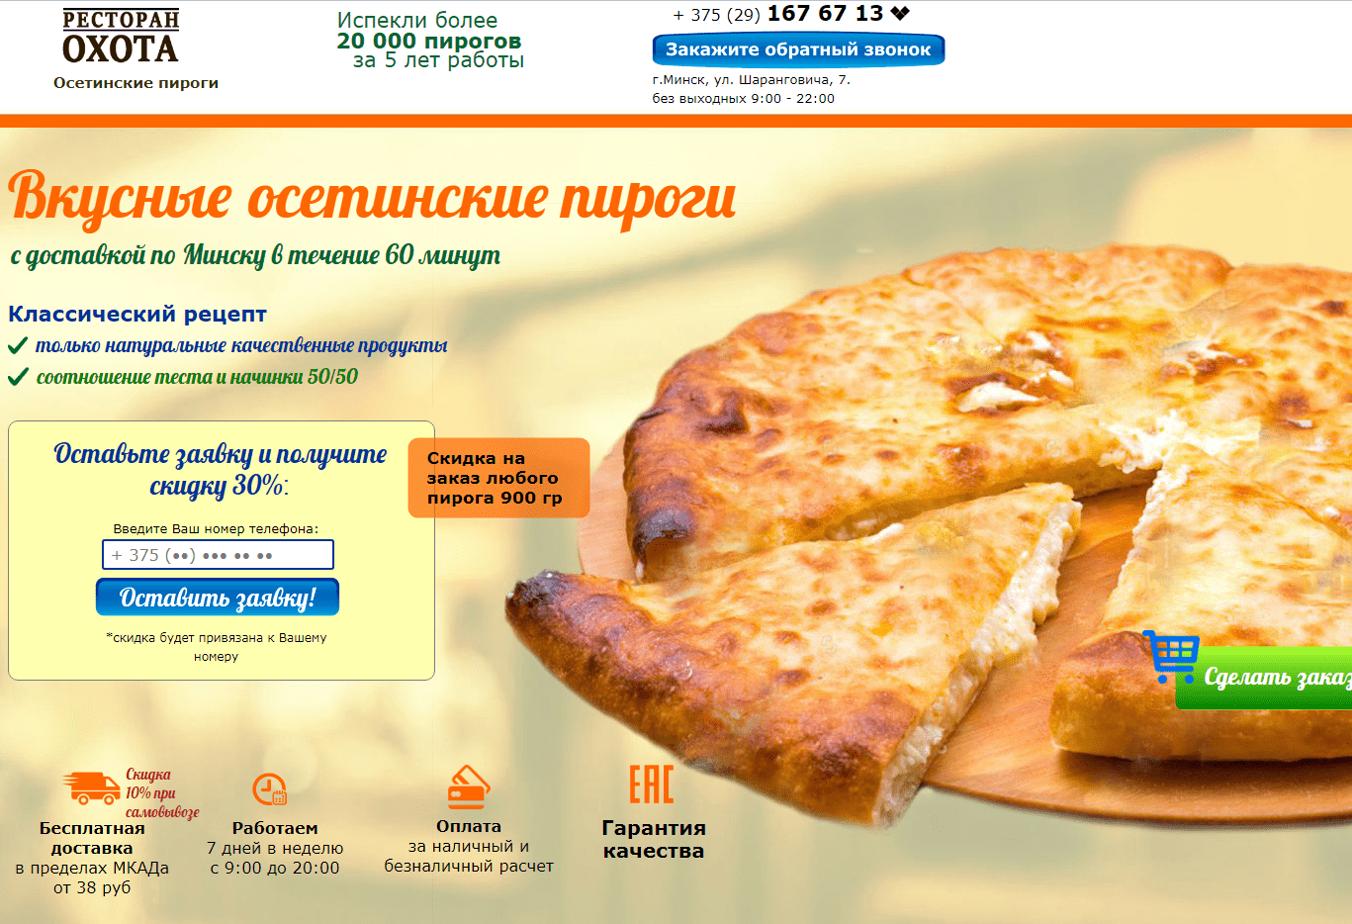 Кейс № 21 Настоящие осетинские пироги в Минске